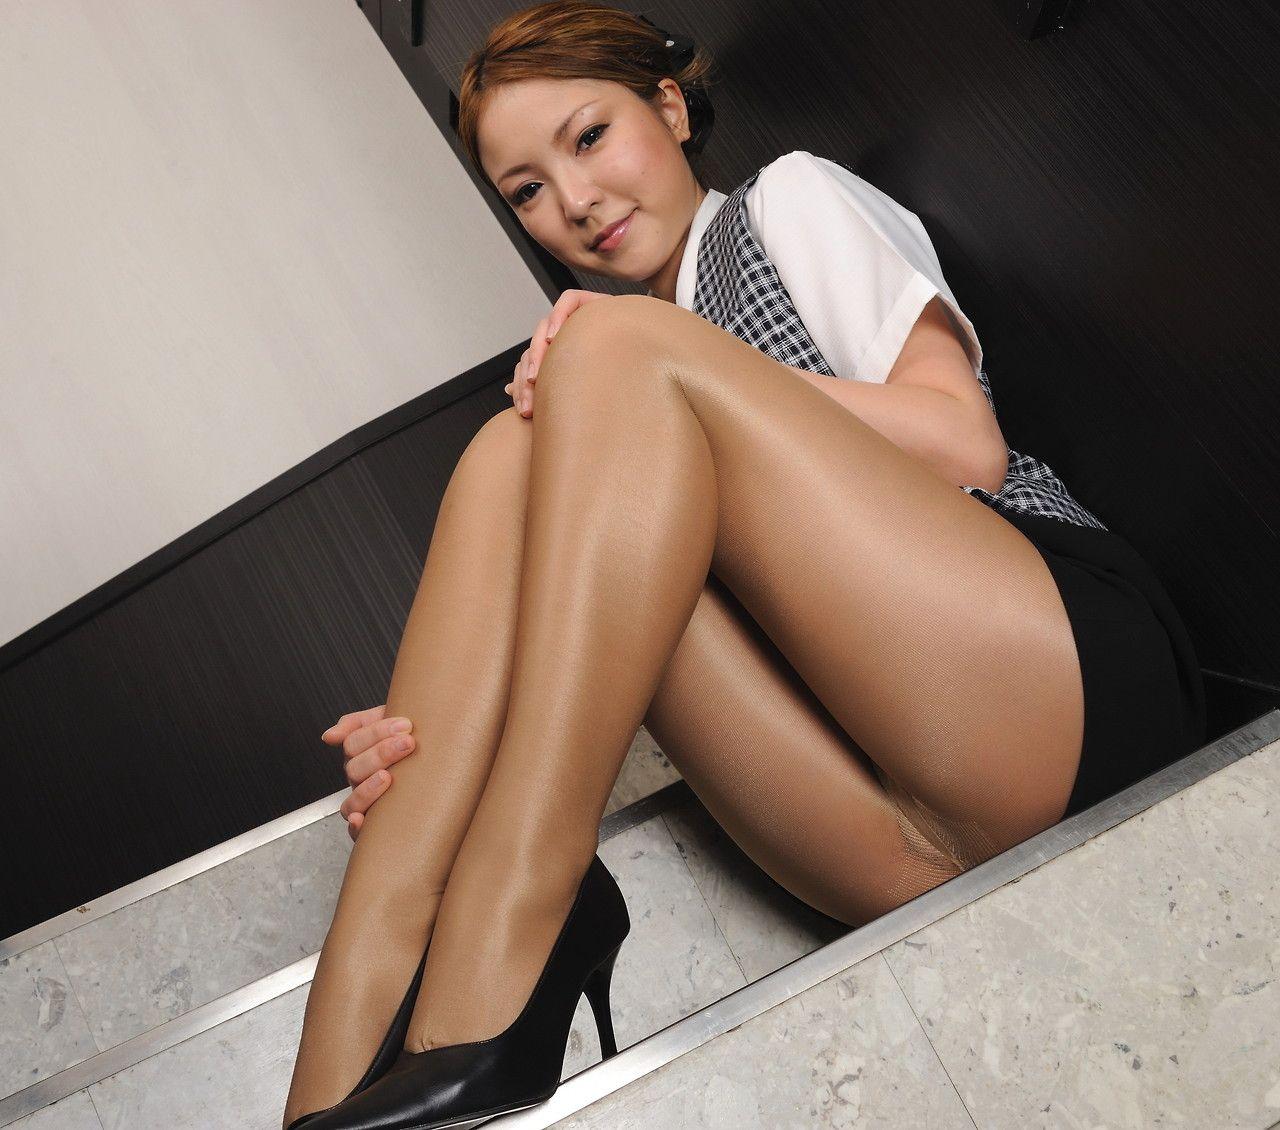 Natalie kane playboy nude